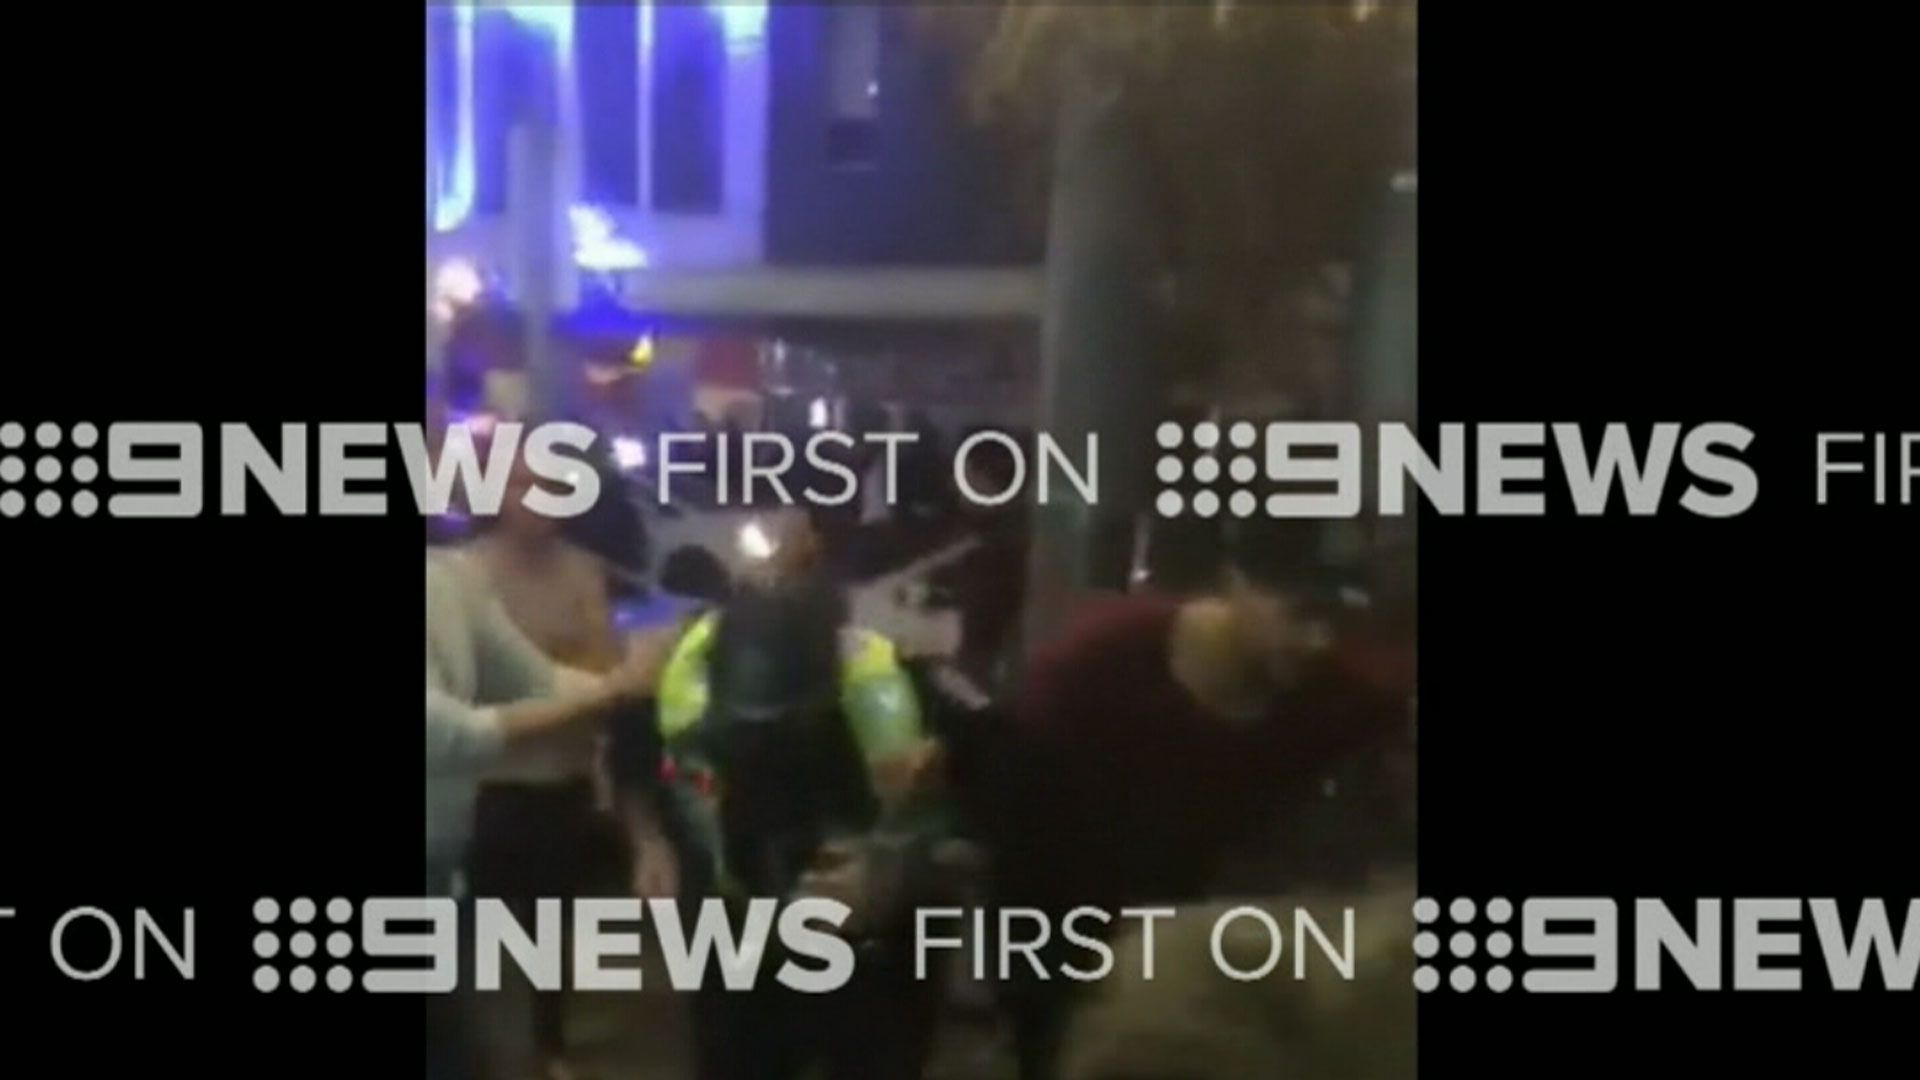 Video shows alleged brawl involving AFL star Paddy Ryder